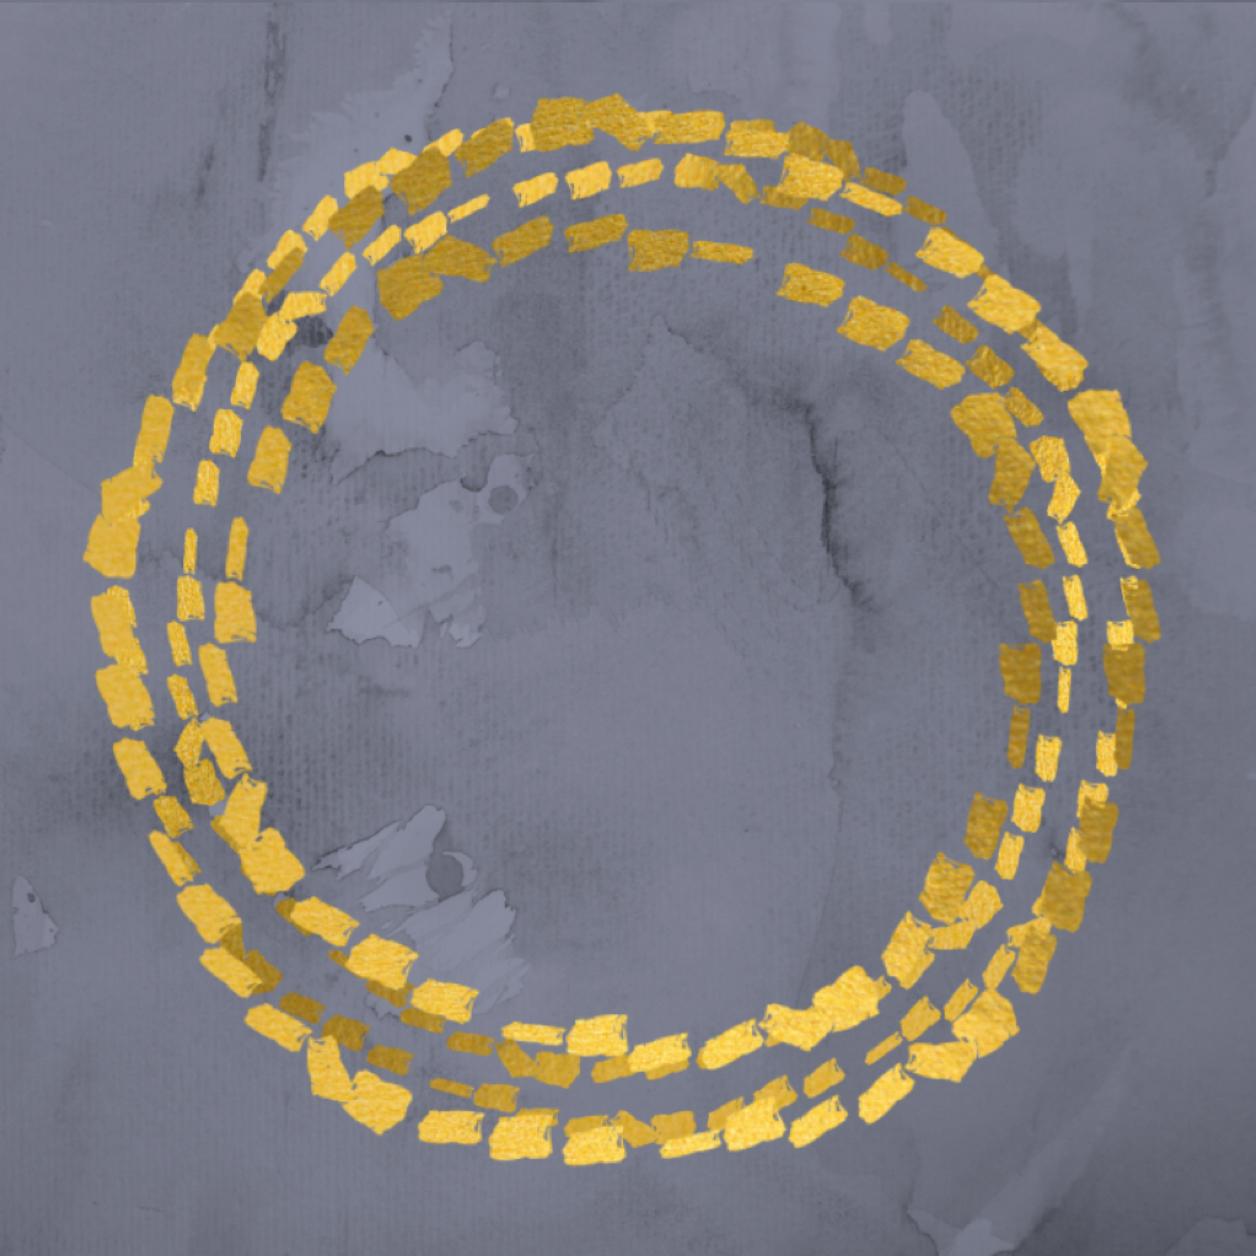 Artwork of three gold circles circumscribing an arena, on a grey water color backgroun